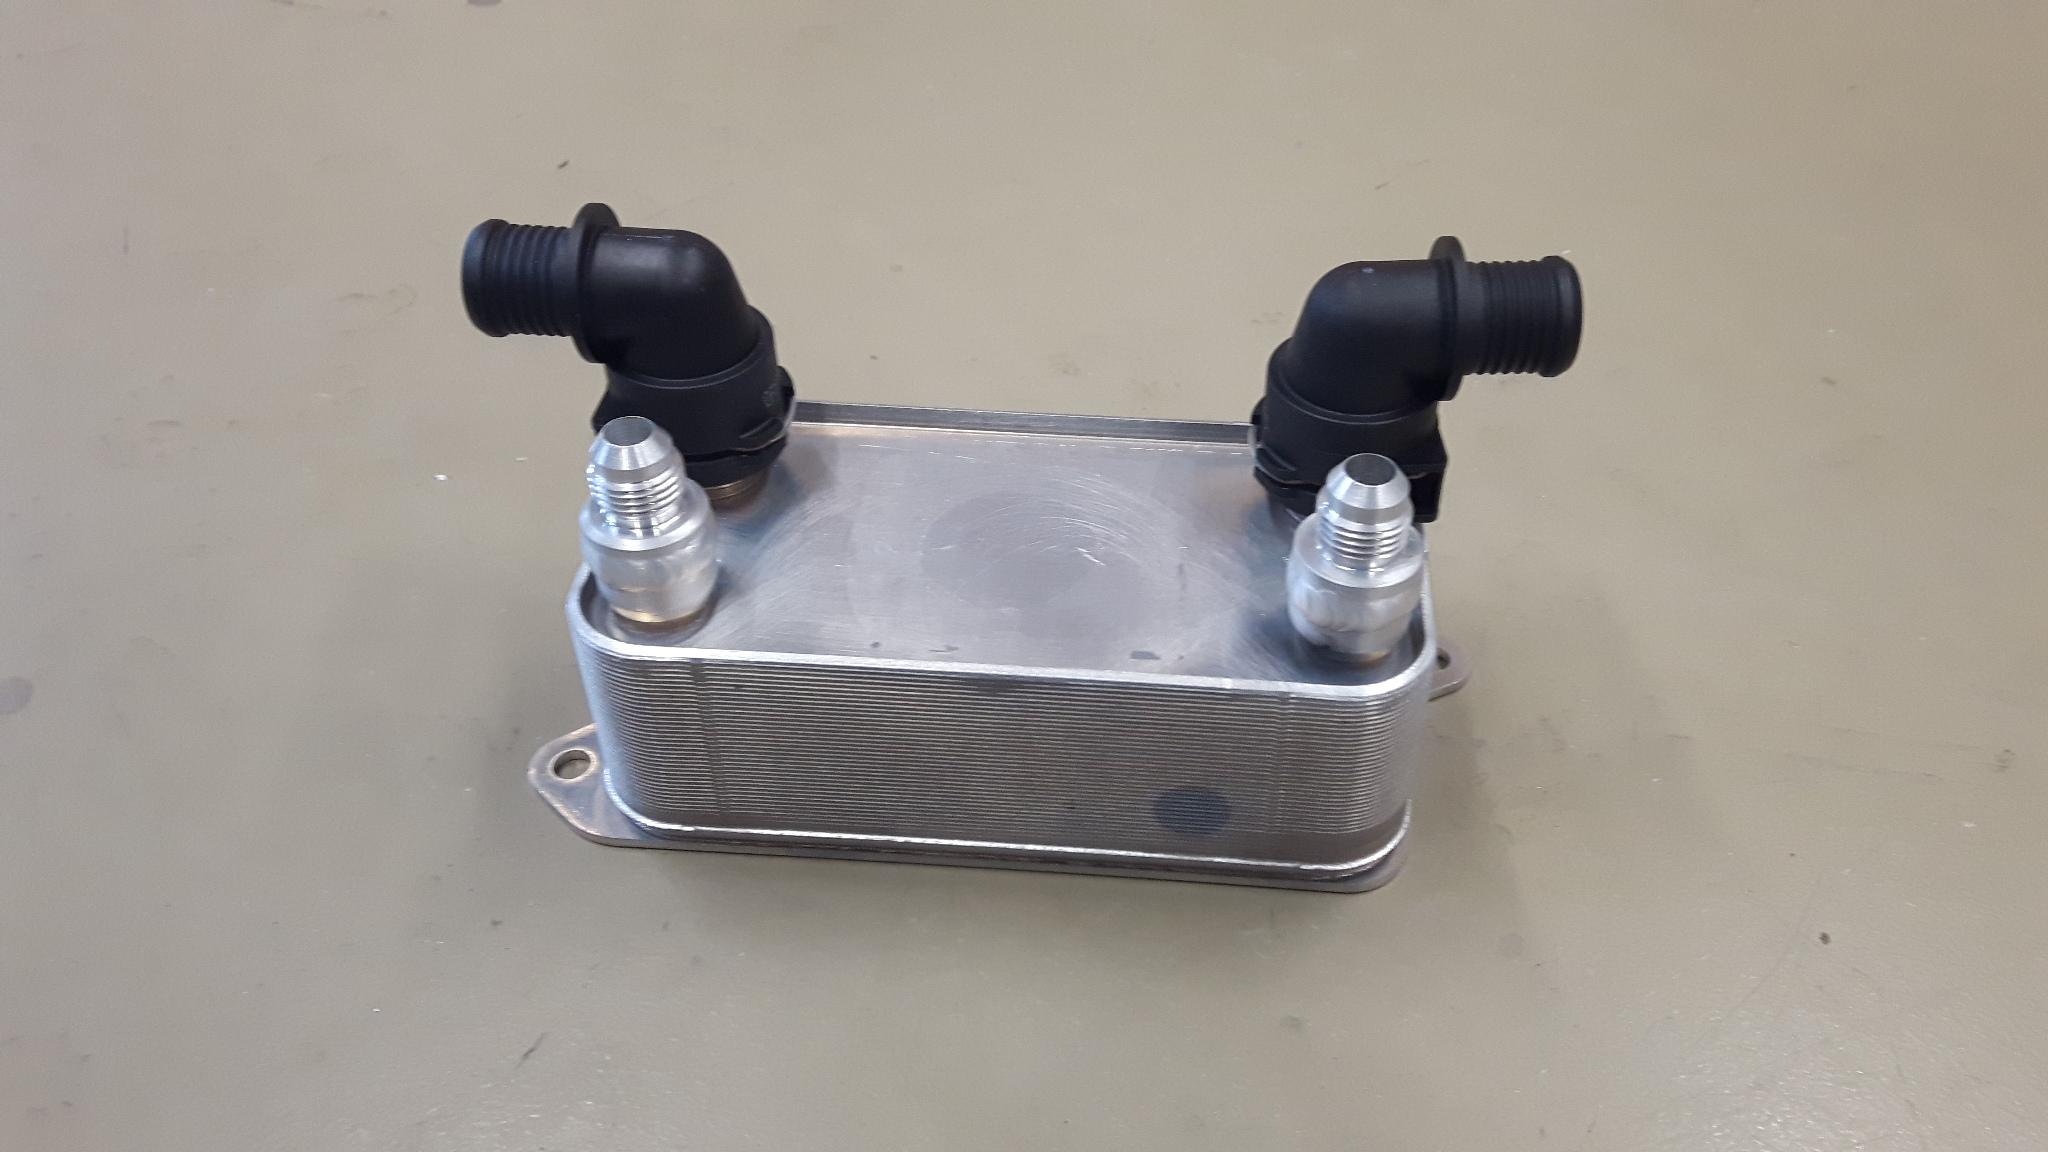 Oliekoeler versnellingsbak / warmtewisselaar D6-0